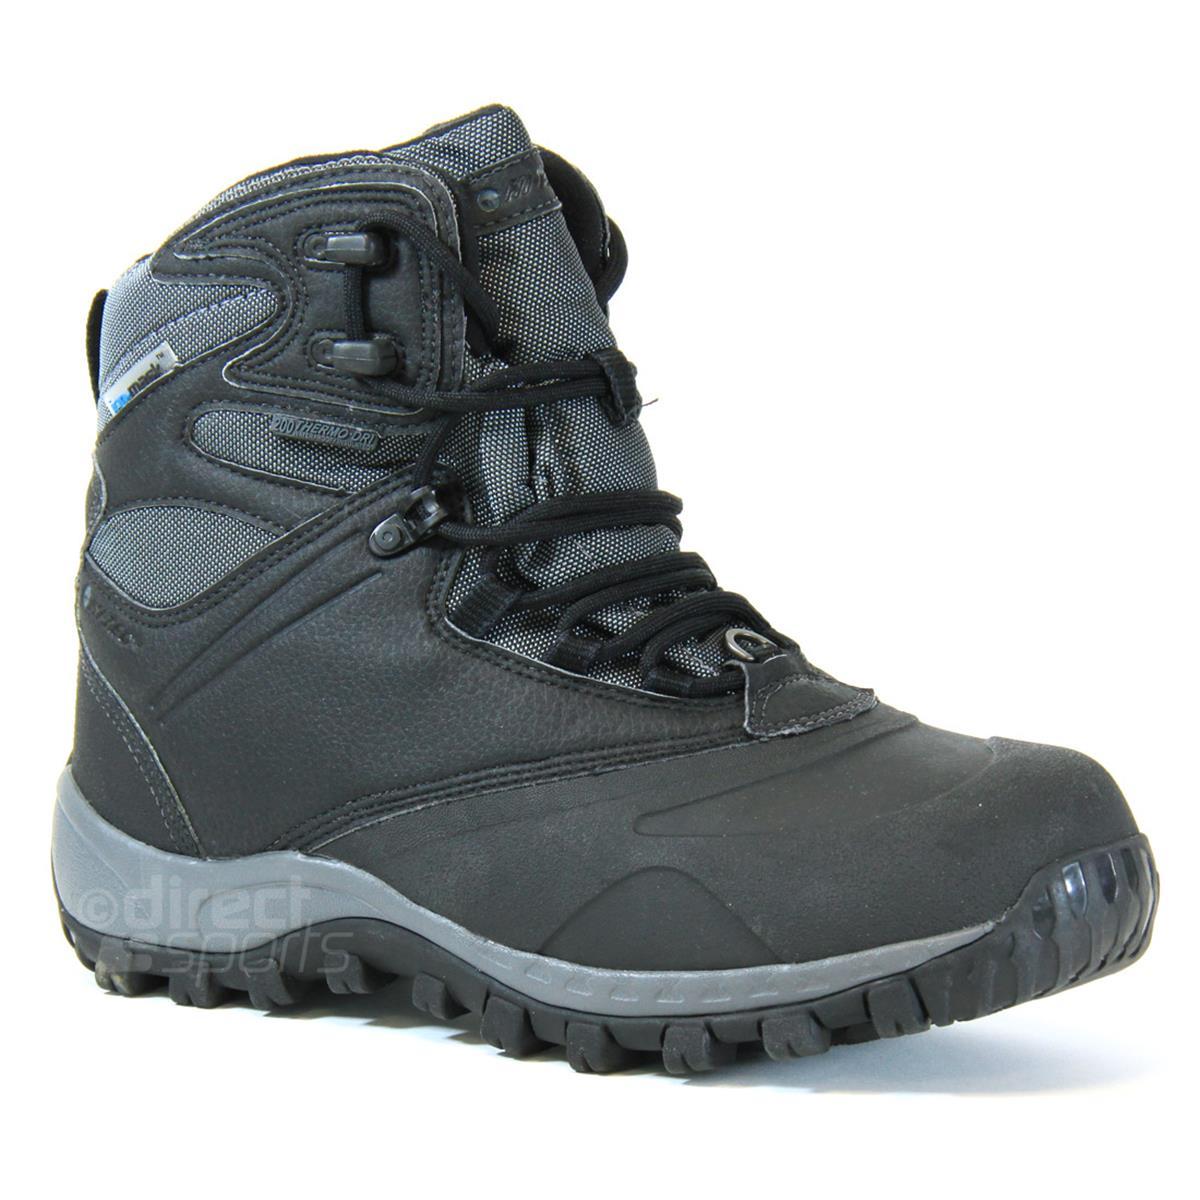 c4e0a725c74 Hi-Tec Bear Valley 200i Waterproof Mens Boots (Black-Charcoal)    directsportsEshop.co.uk